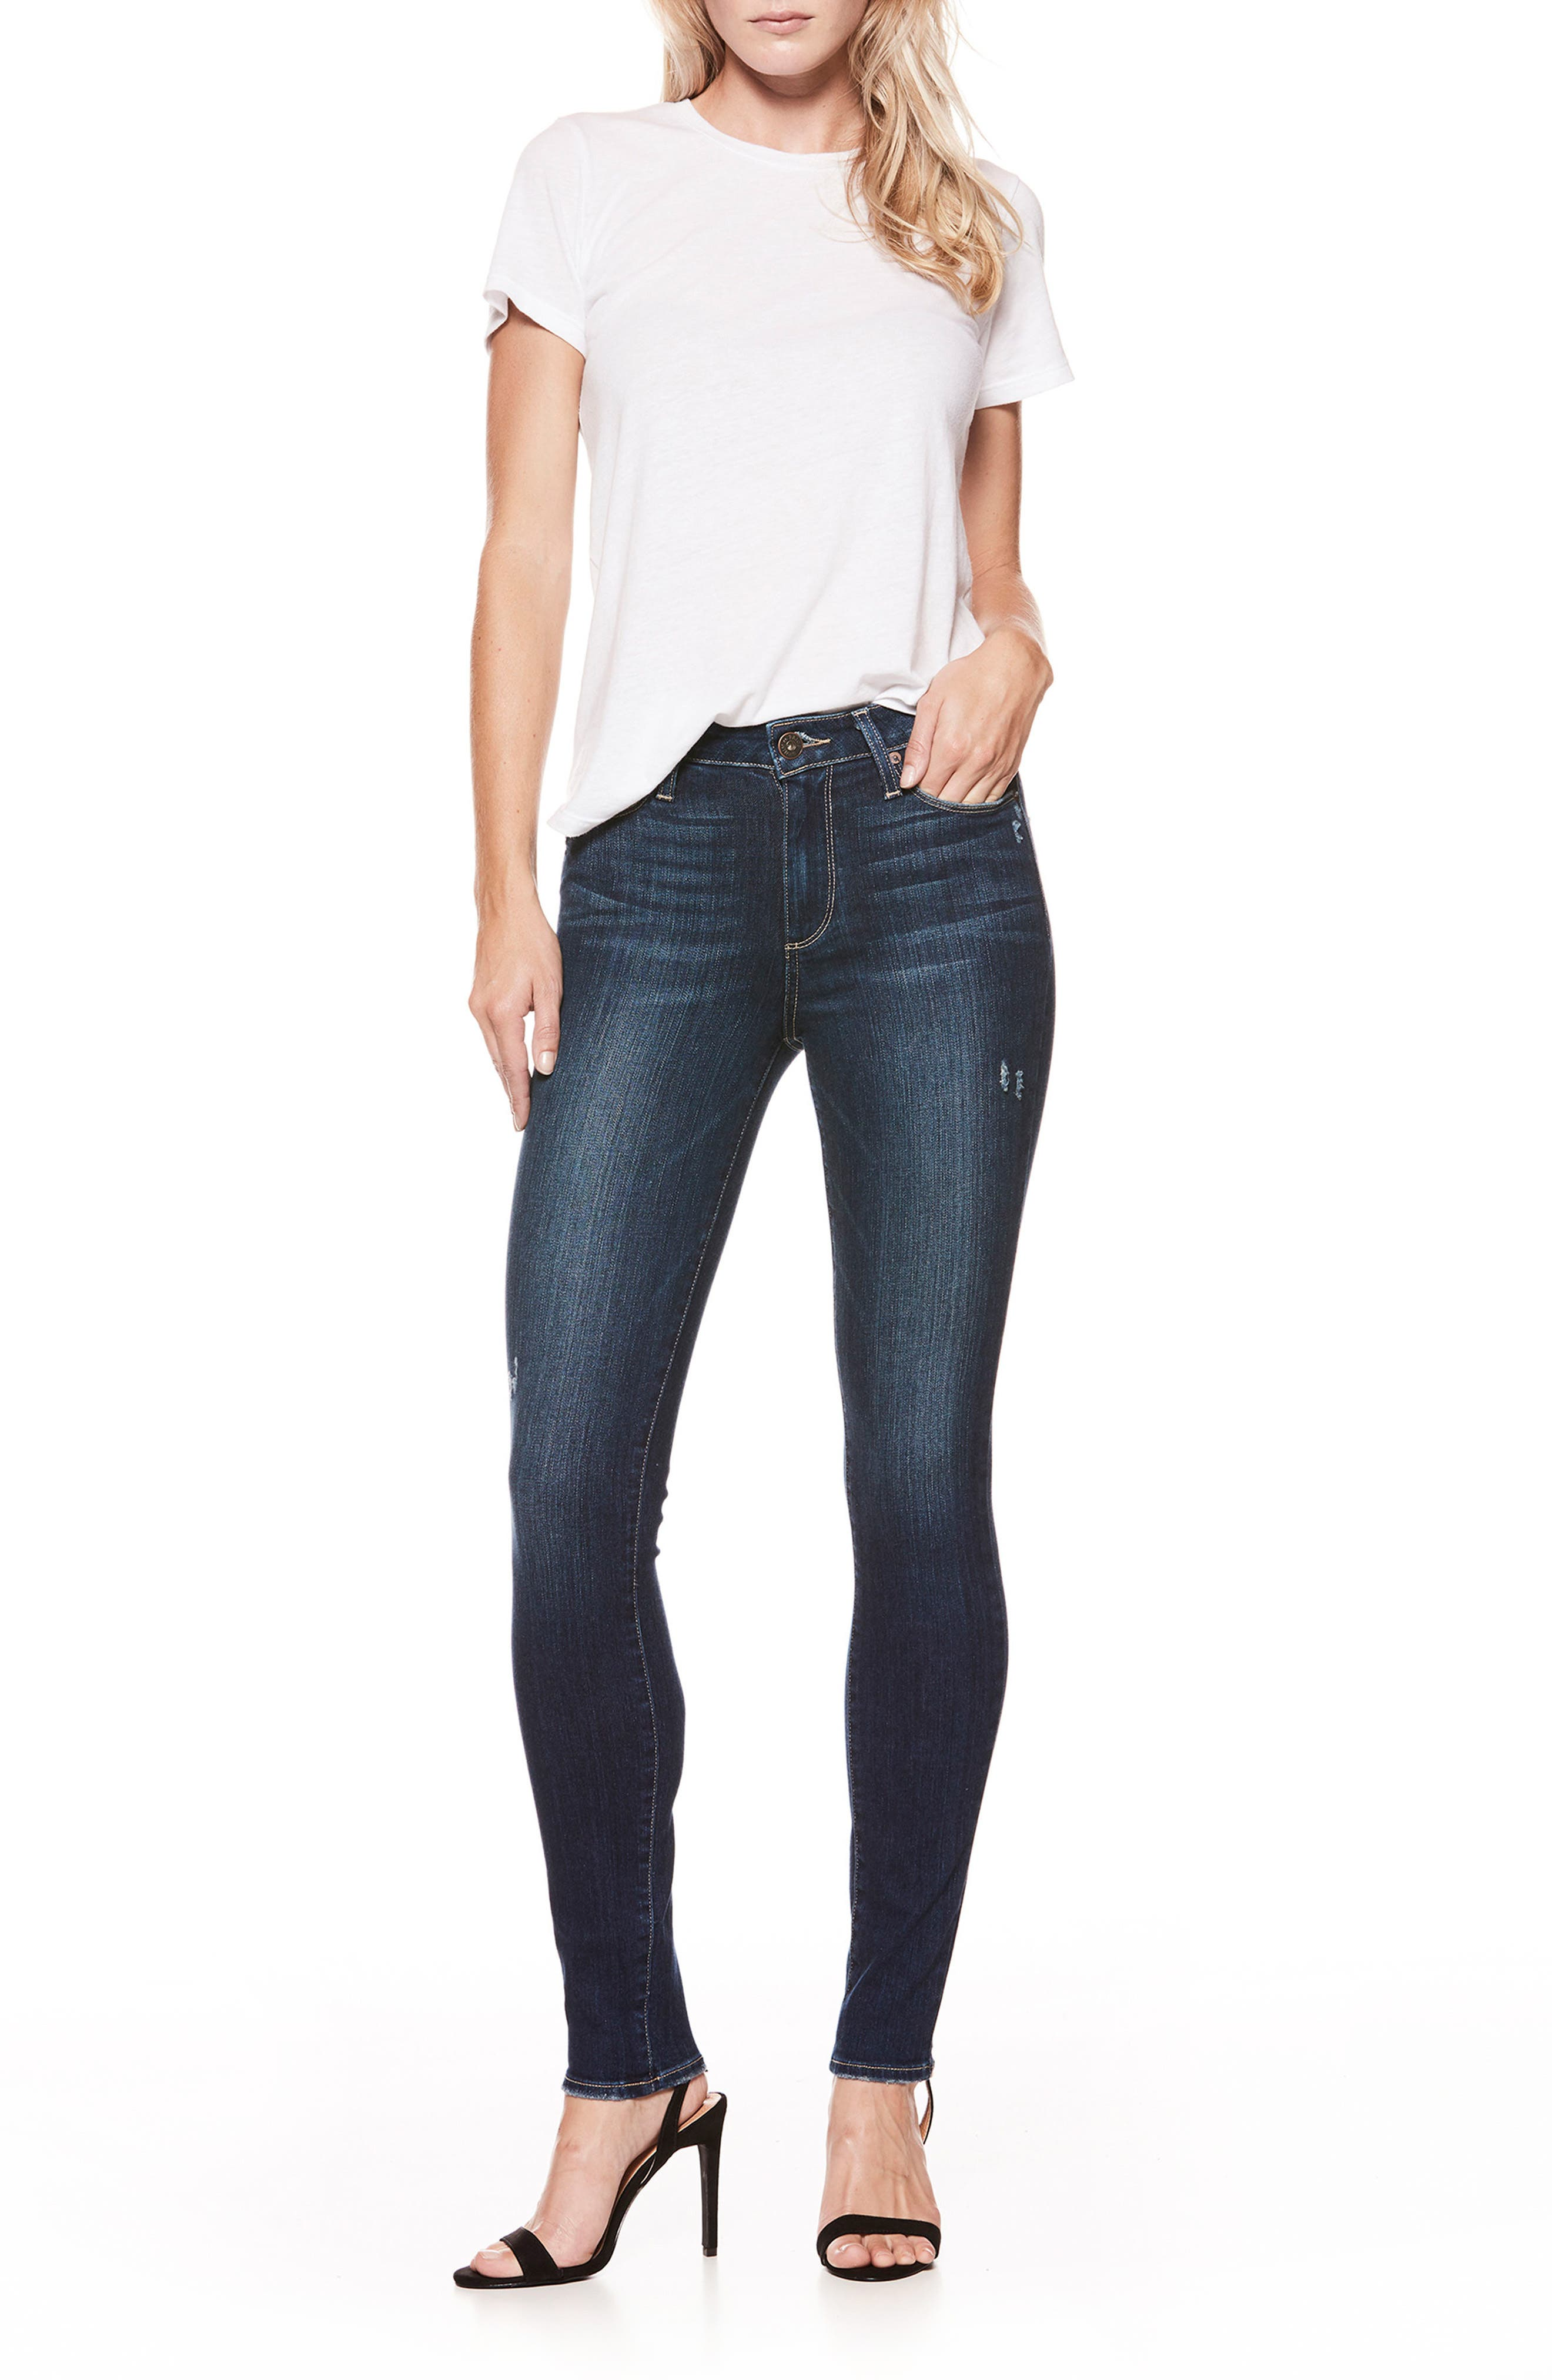 Hoxton High Waist Skinny Jeans,                         Main,                         color, 400